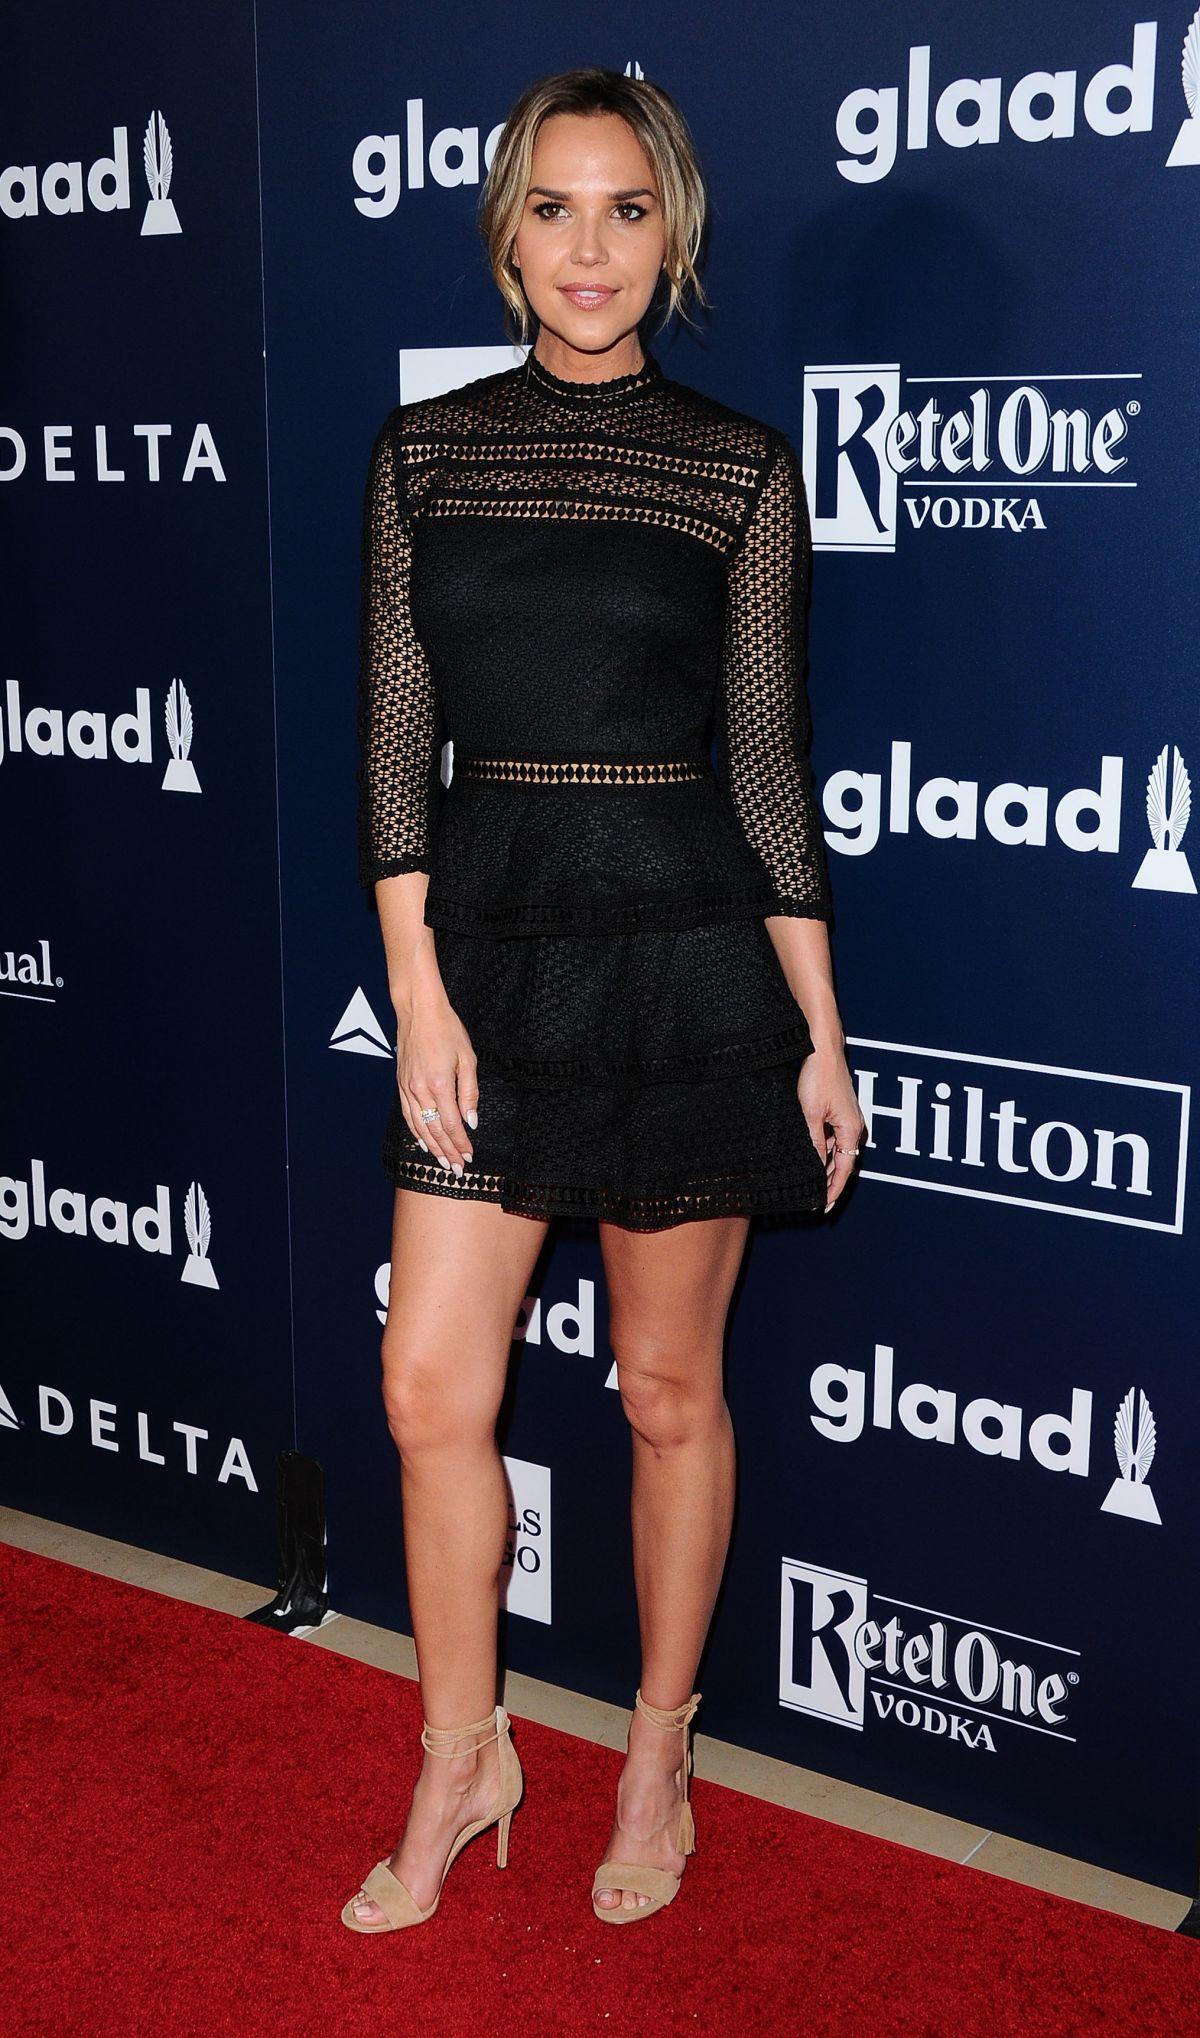 ARIELLE KEBBEL at 2017 Glaad Media Awards in Los Angeles 04/01/2017